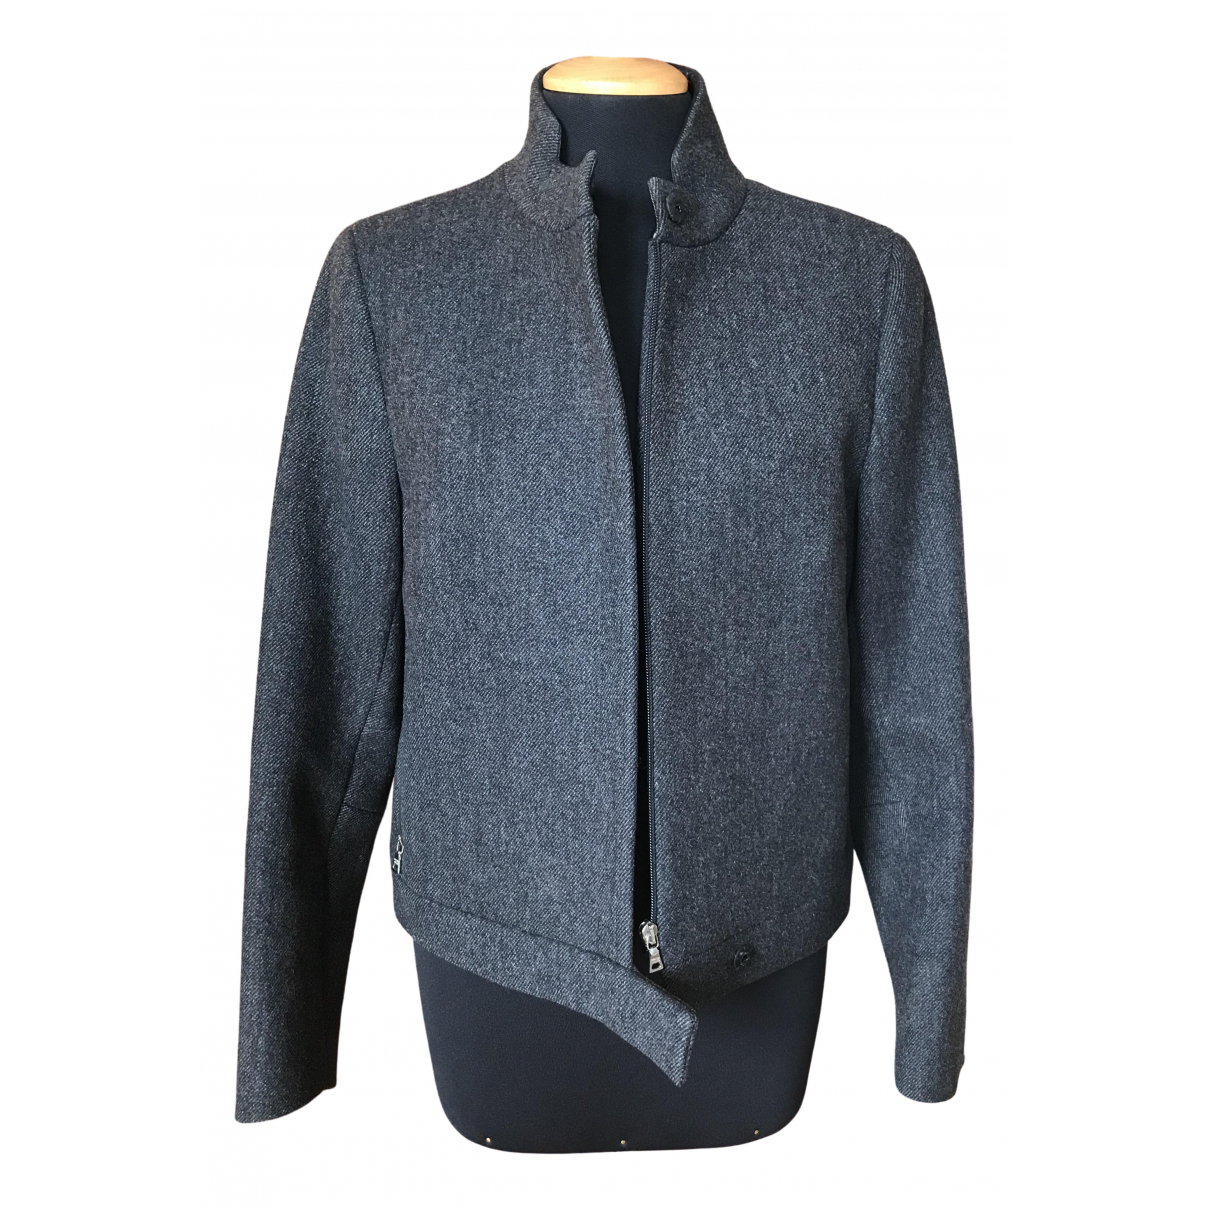 Prada - Veste   pour femme en tweed - anthracite